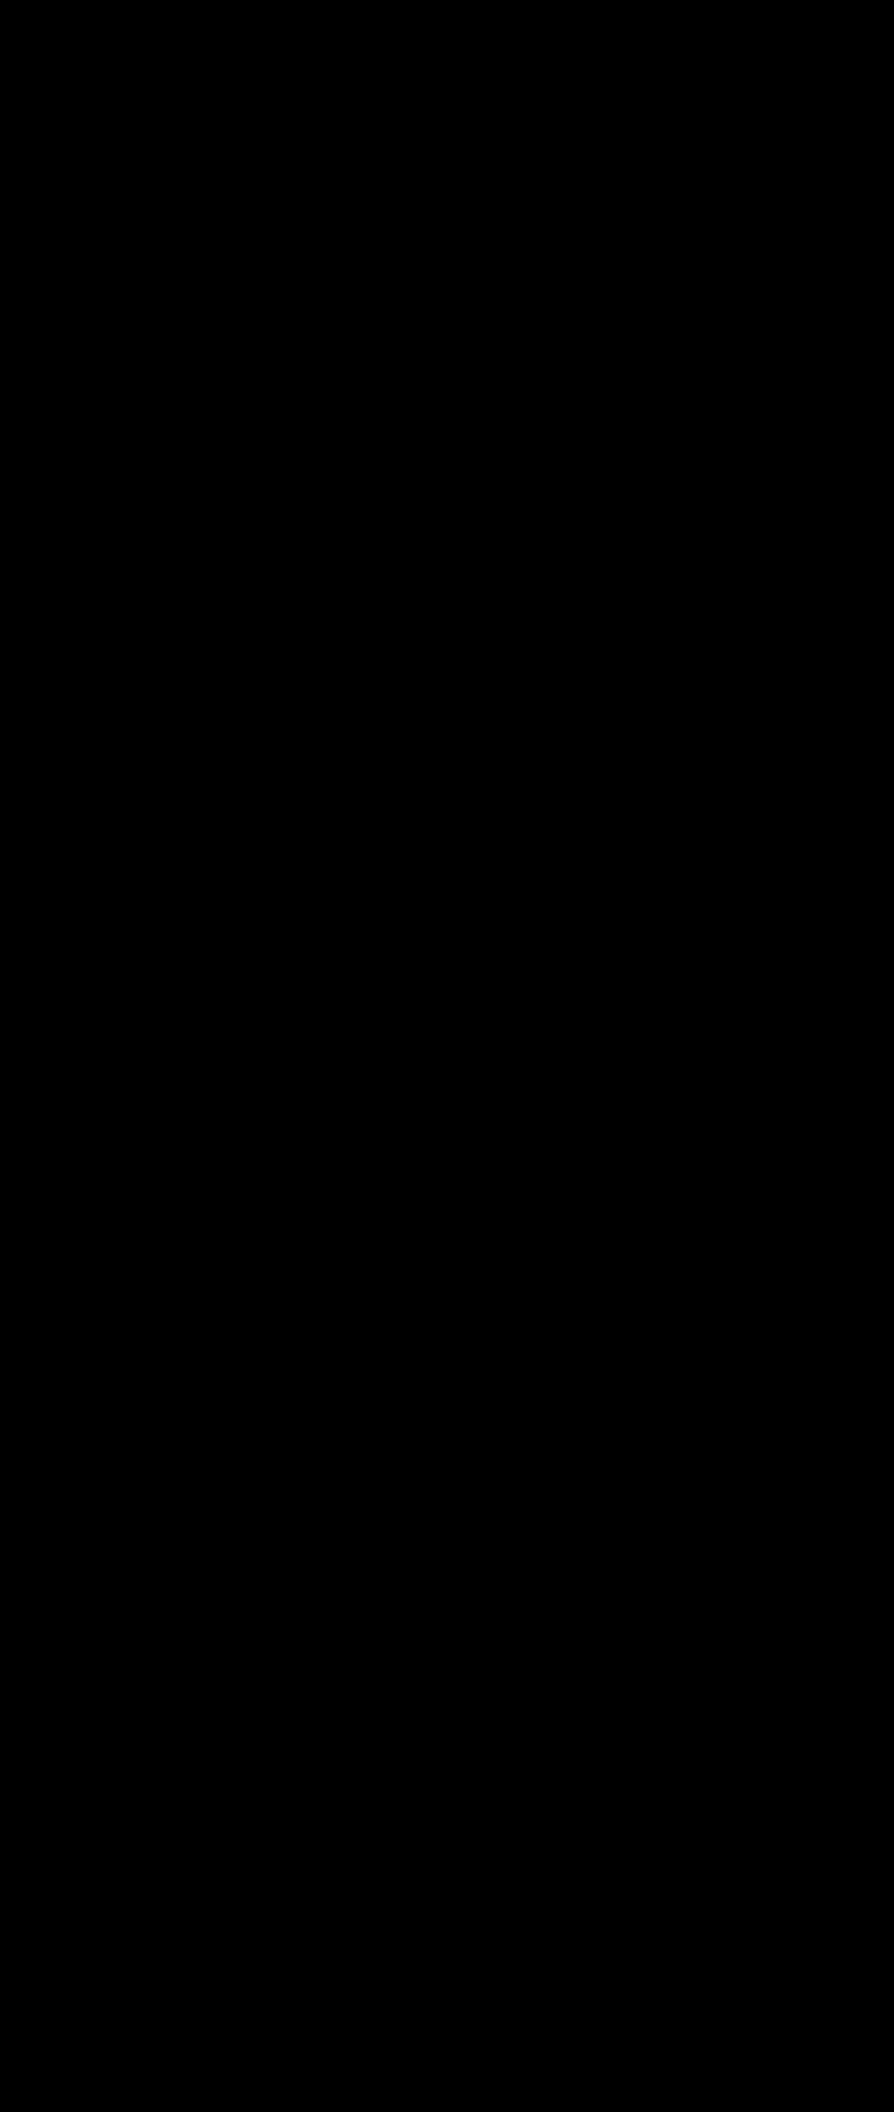 894x2112 Clipart Female Body Silhouette Lemonize